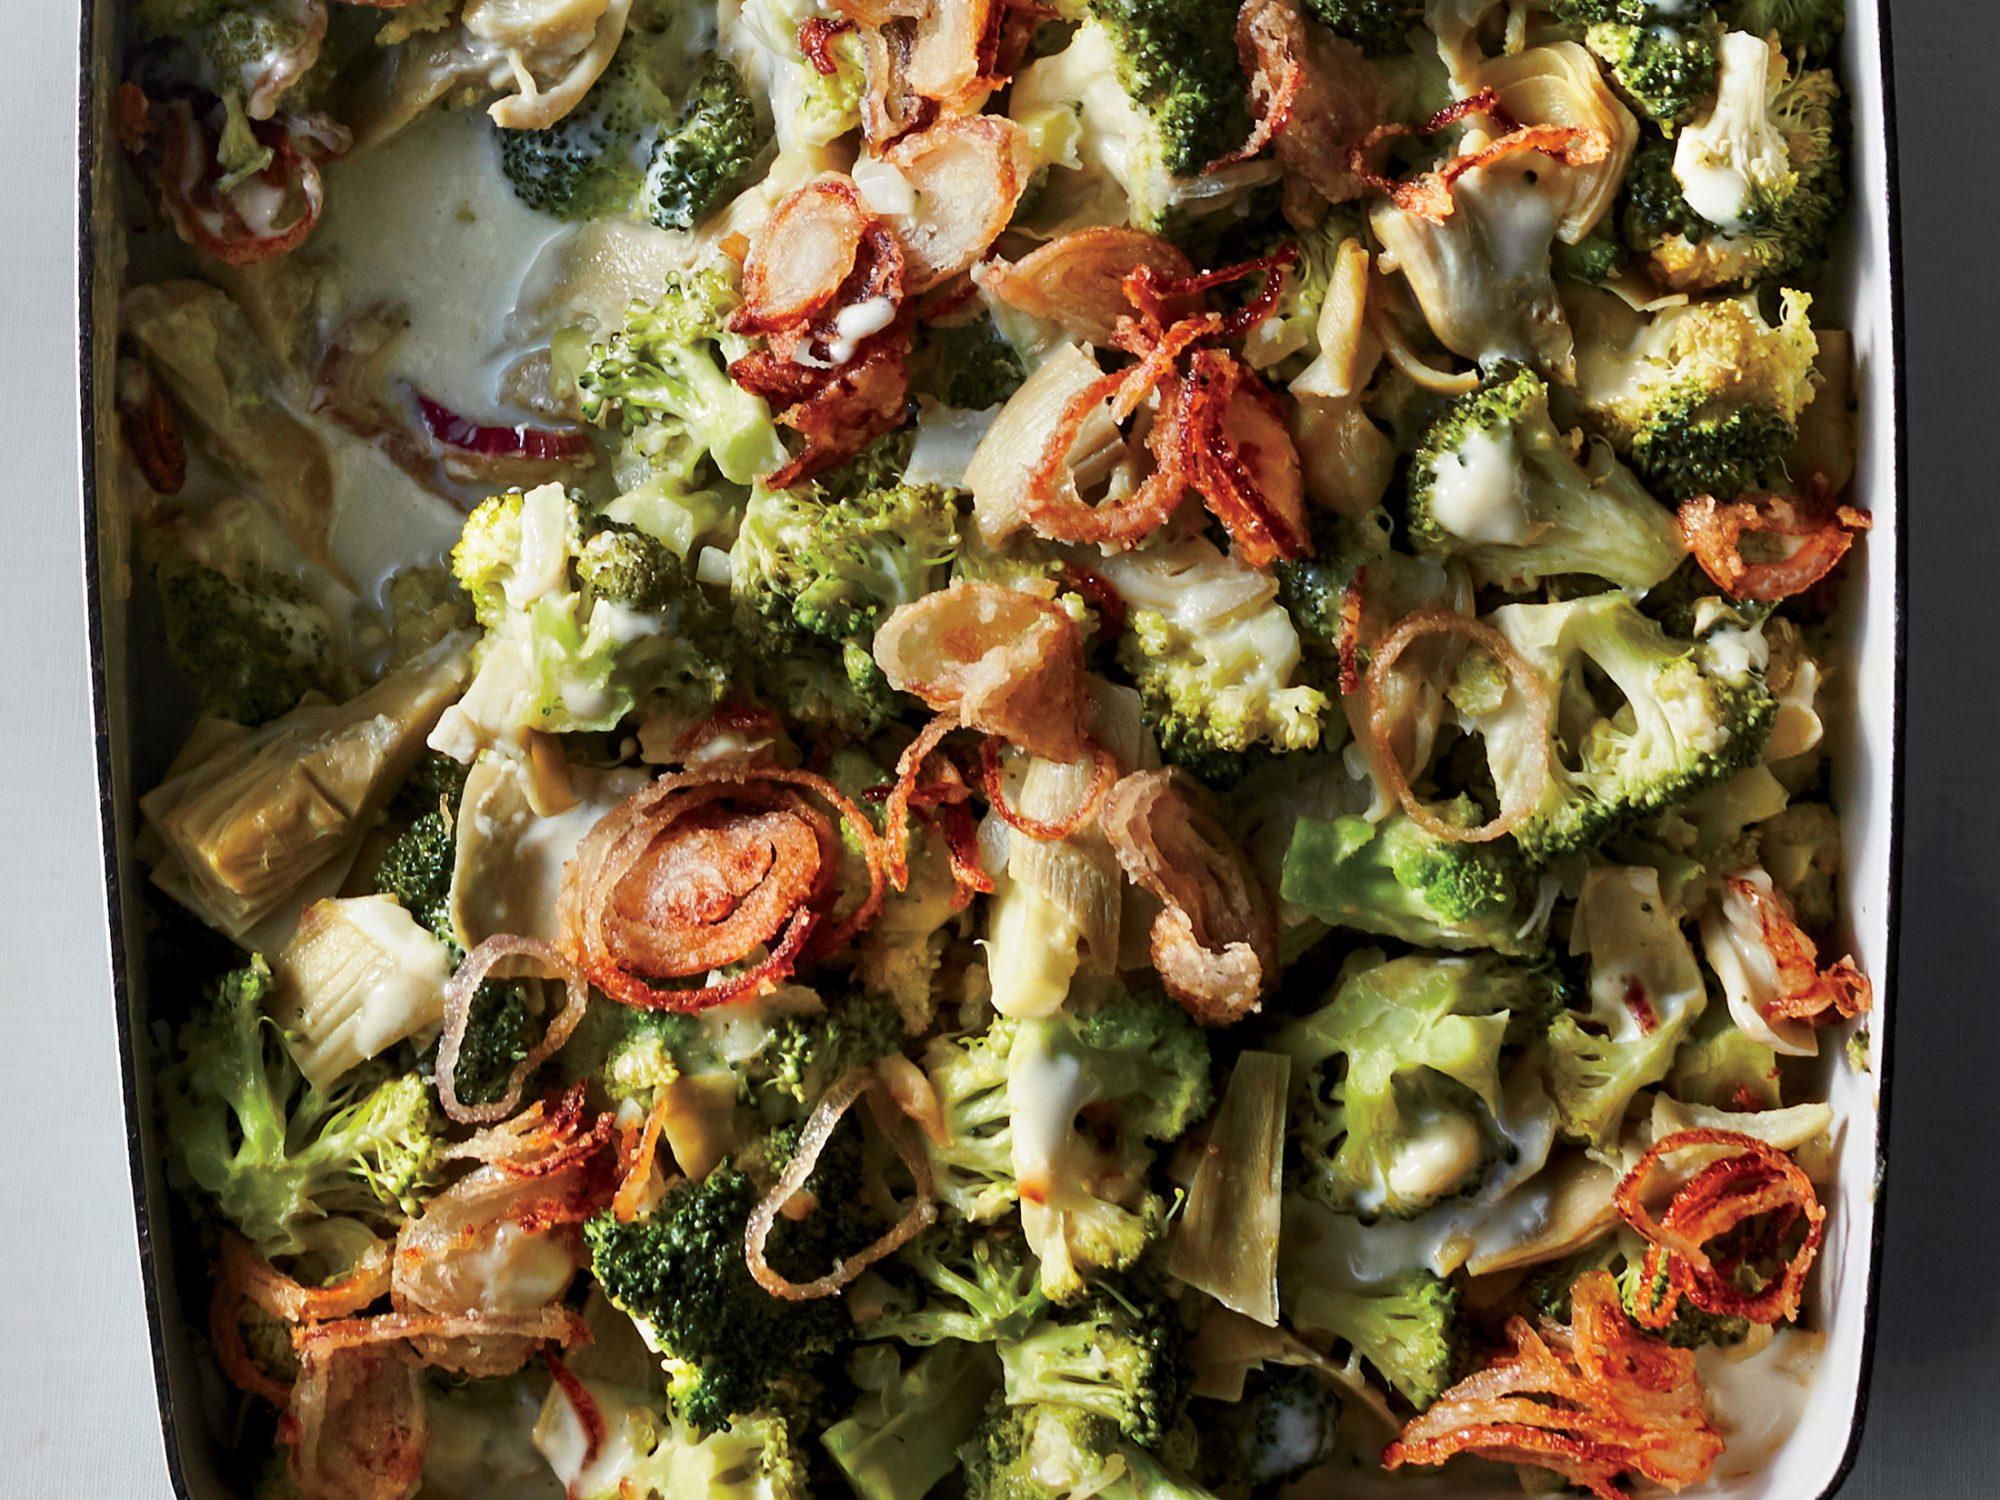 ck-Broccoli-Artichoke Casserole